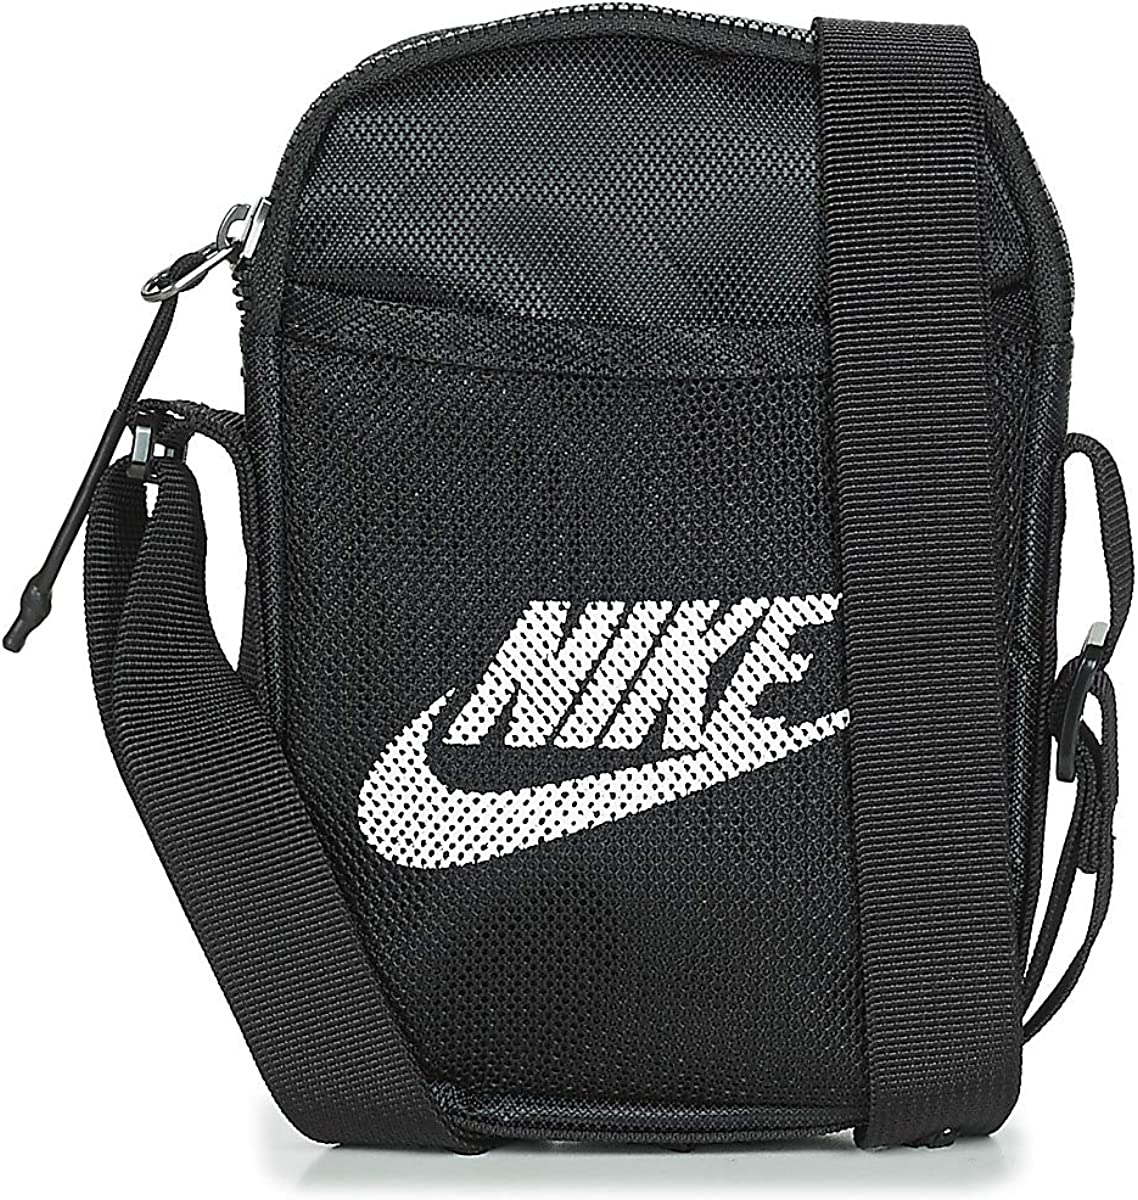 Nike NK HERITAGE S SMIT Bolso pequeño/Cartera de mano hombres Negro Bolso pequeño/Cartera